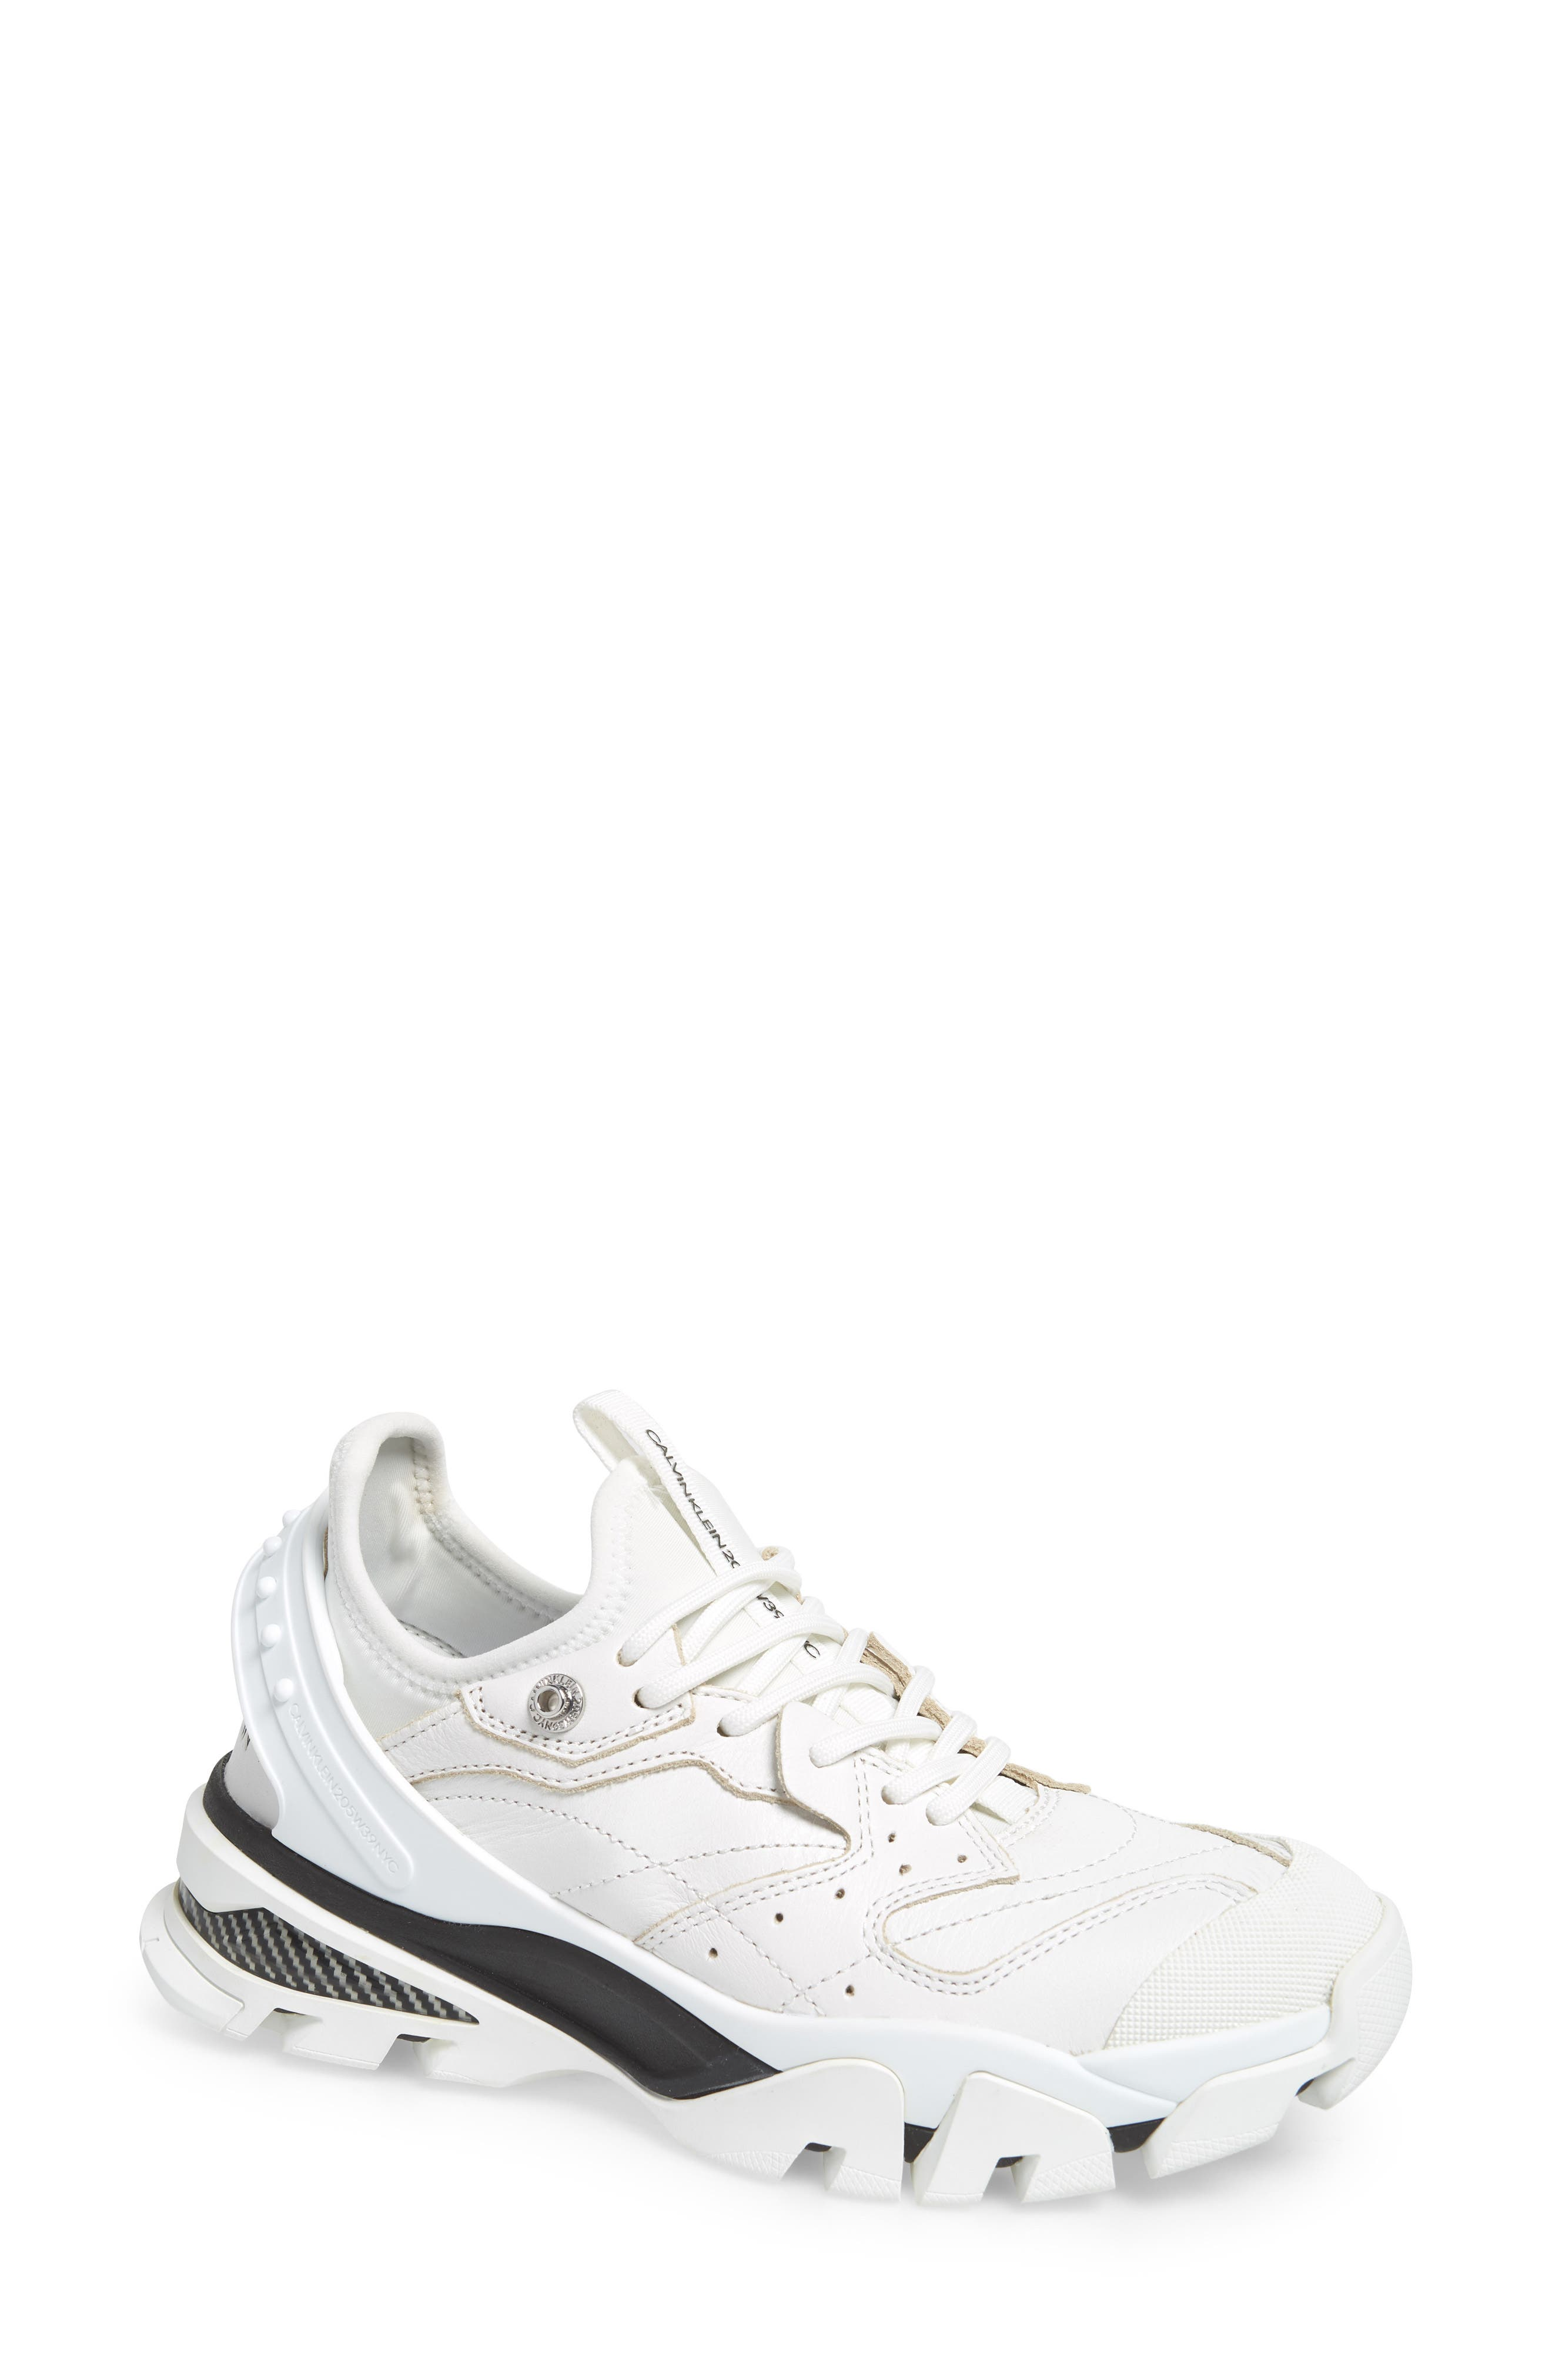 CALVIN KLEIN, 205W39NYC Carla Sneaker, Main thumbnail 1, color, WHITE/ BLACK/ BLACK